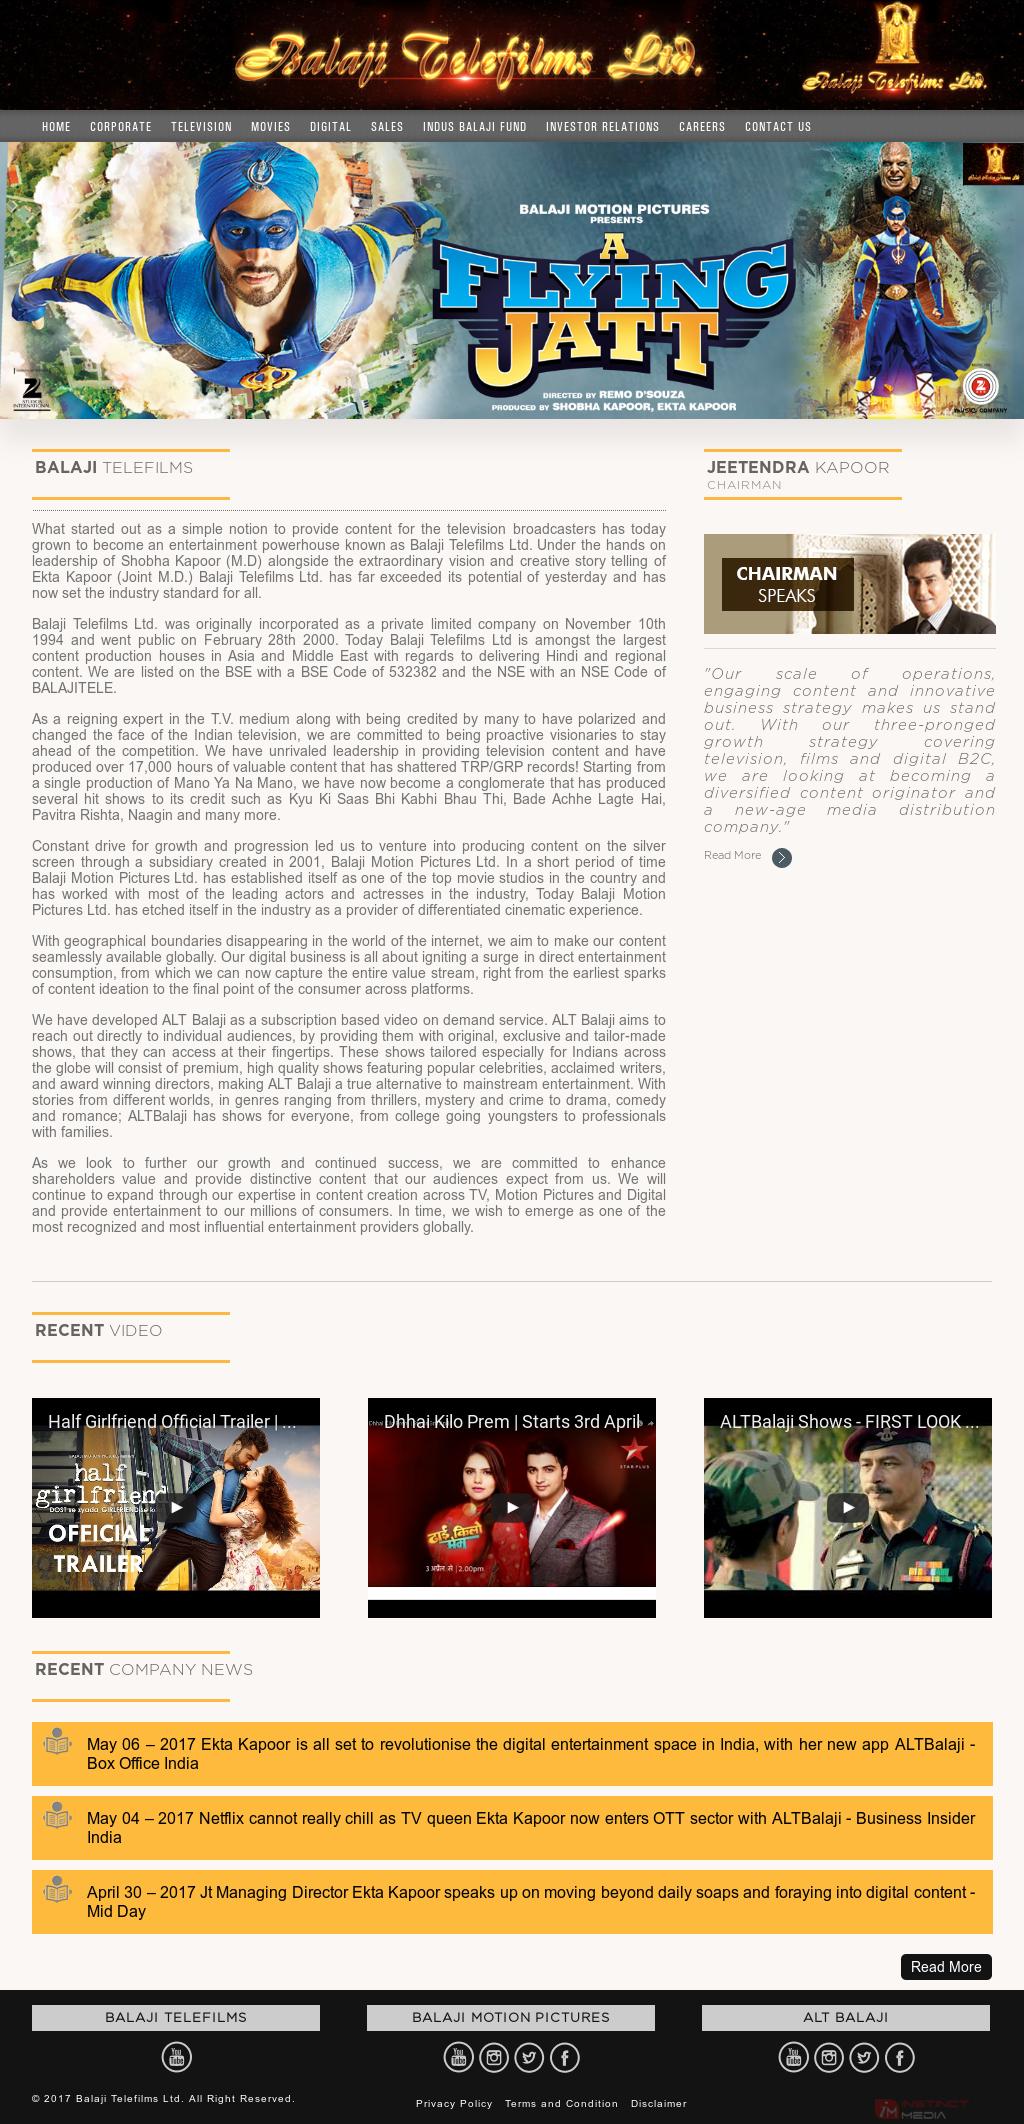 Balaji Telefilms Competitors, Revenue and Employees - Owler Company